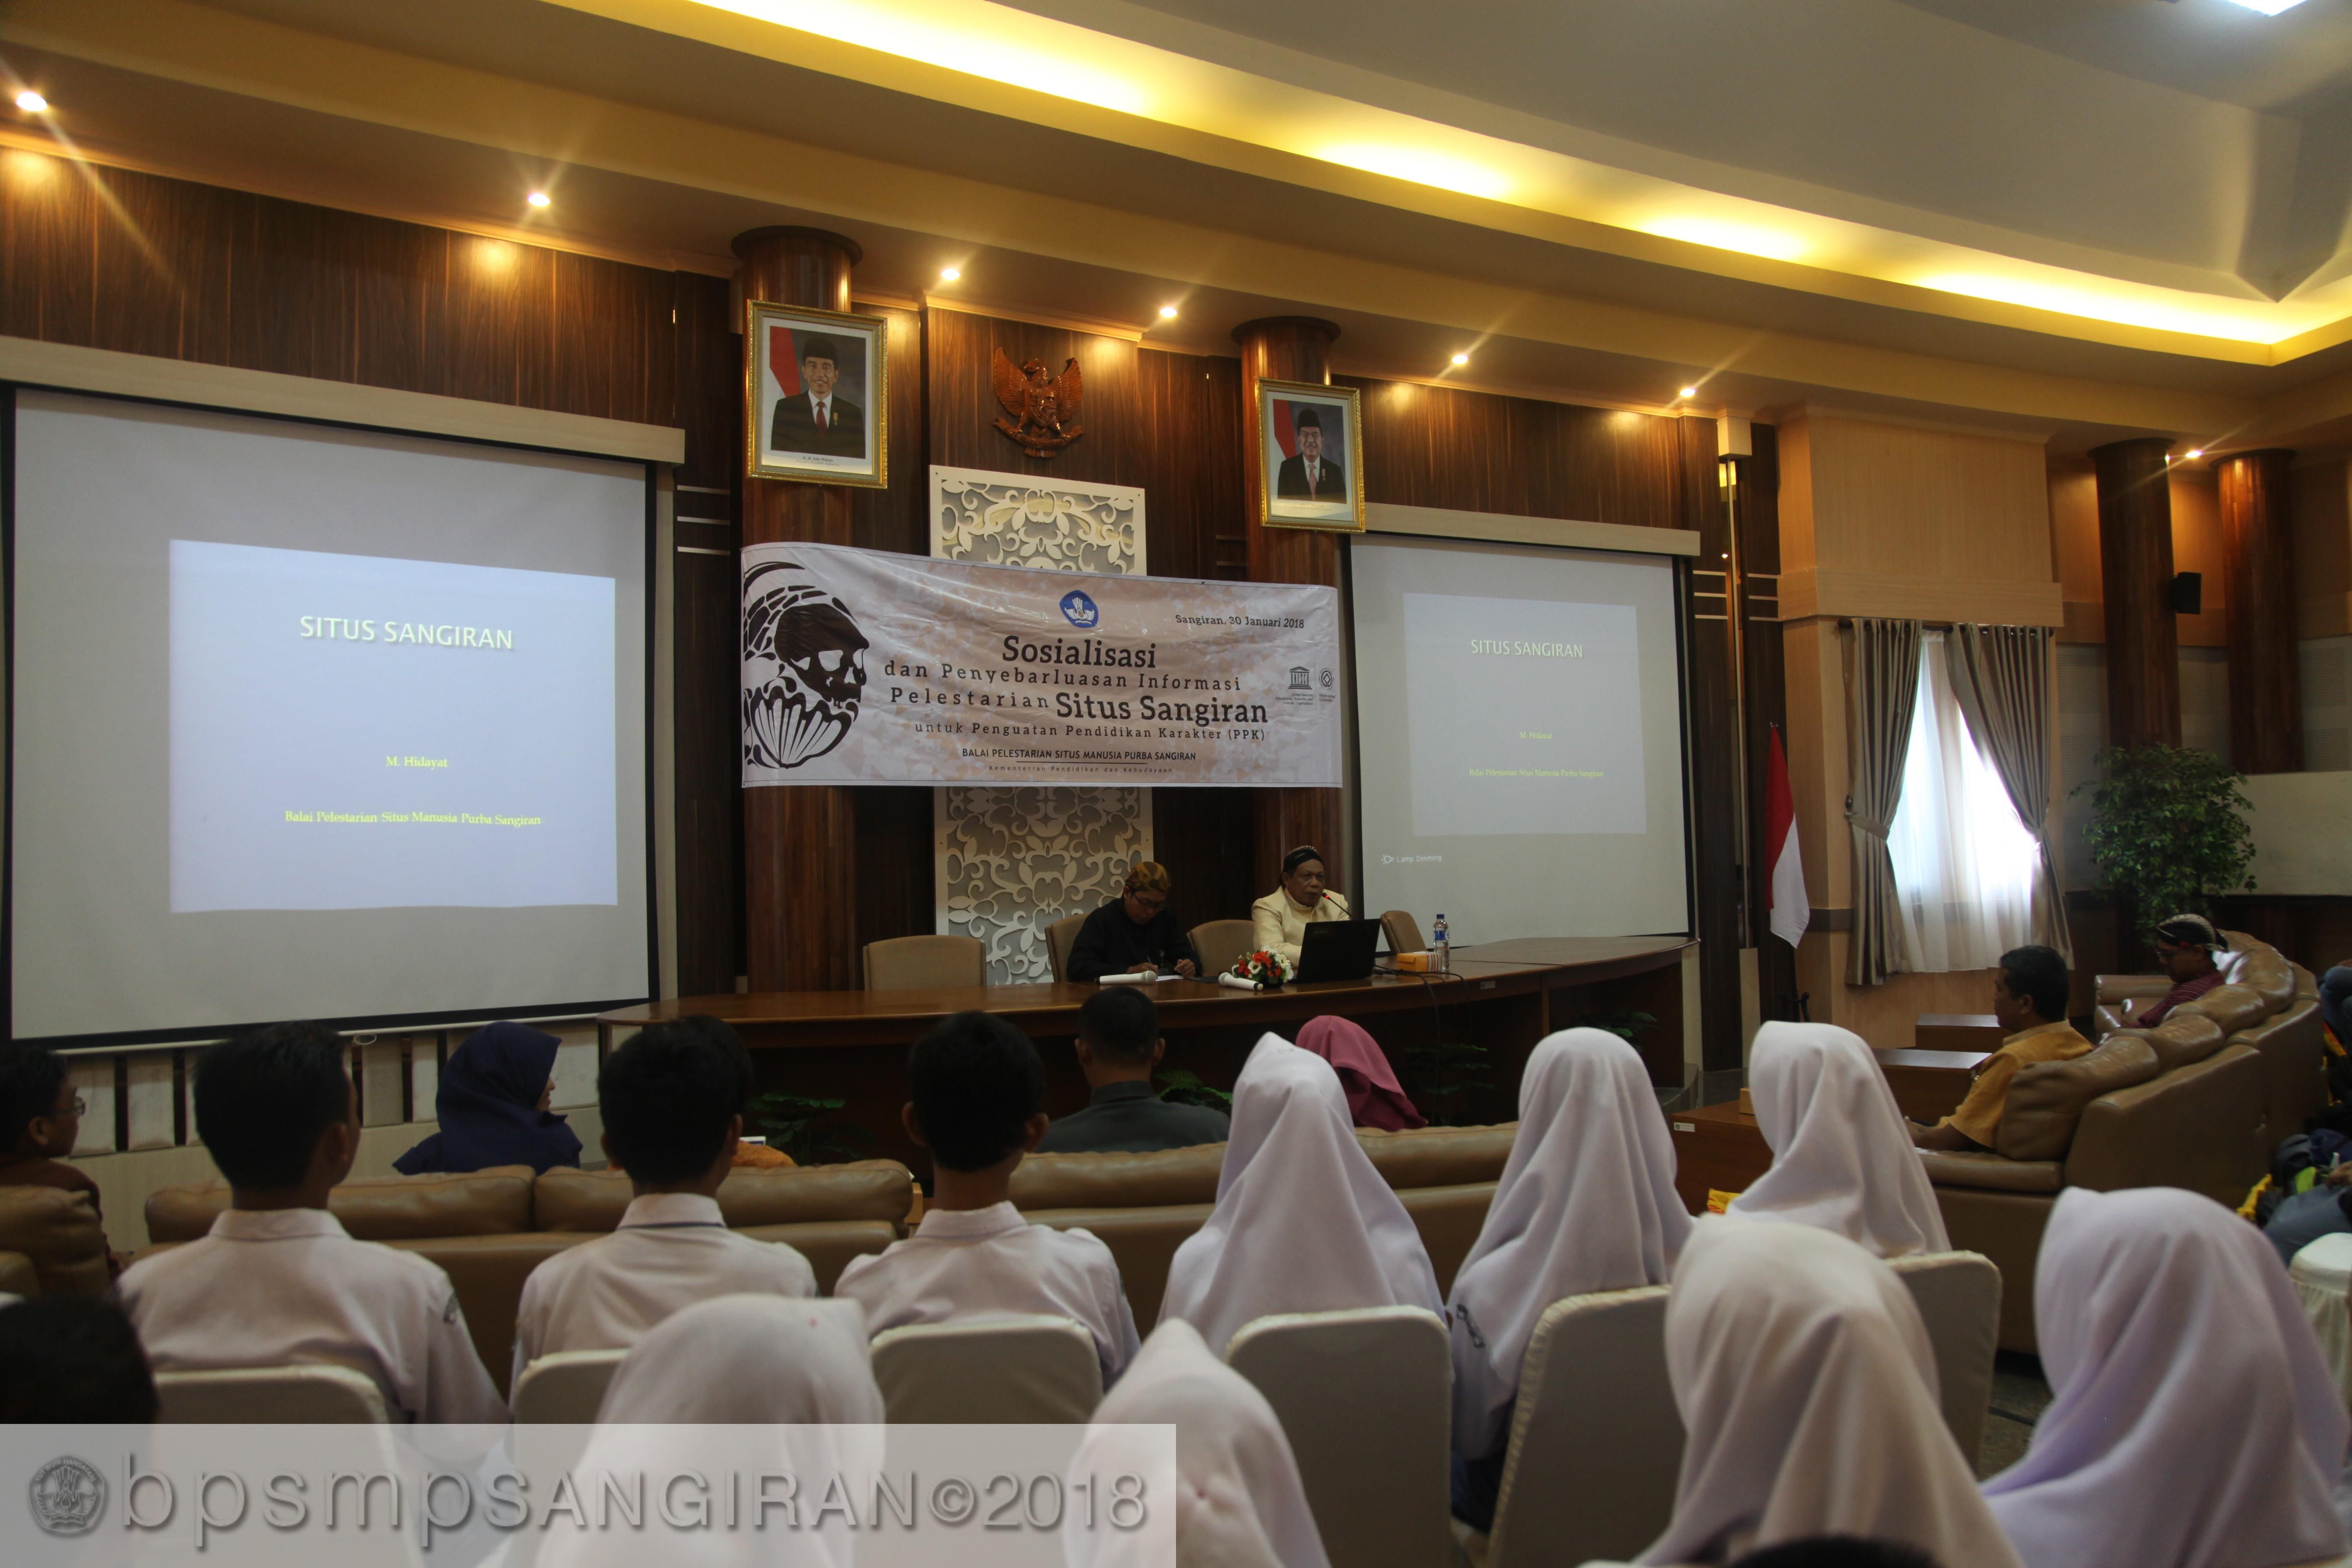 Read more about the article Sosialisasi Oleh BPSMP Sangiran Menyasar Generasi Muda